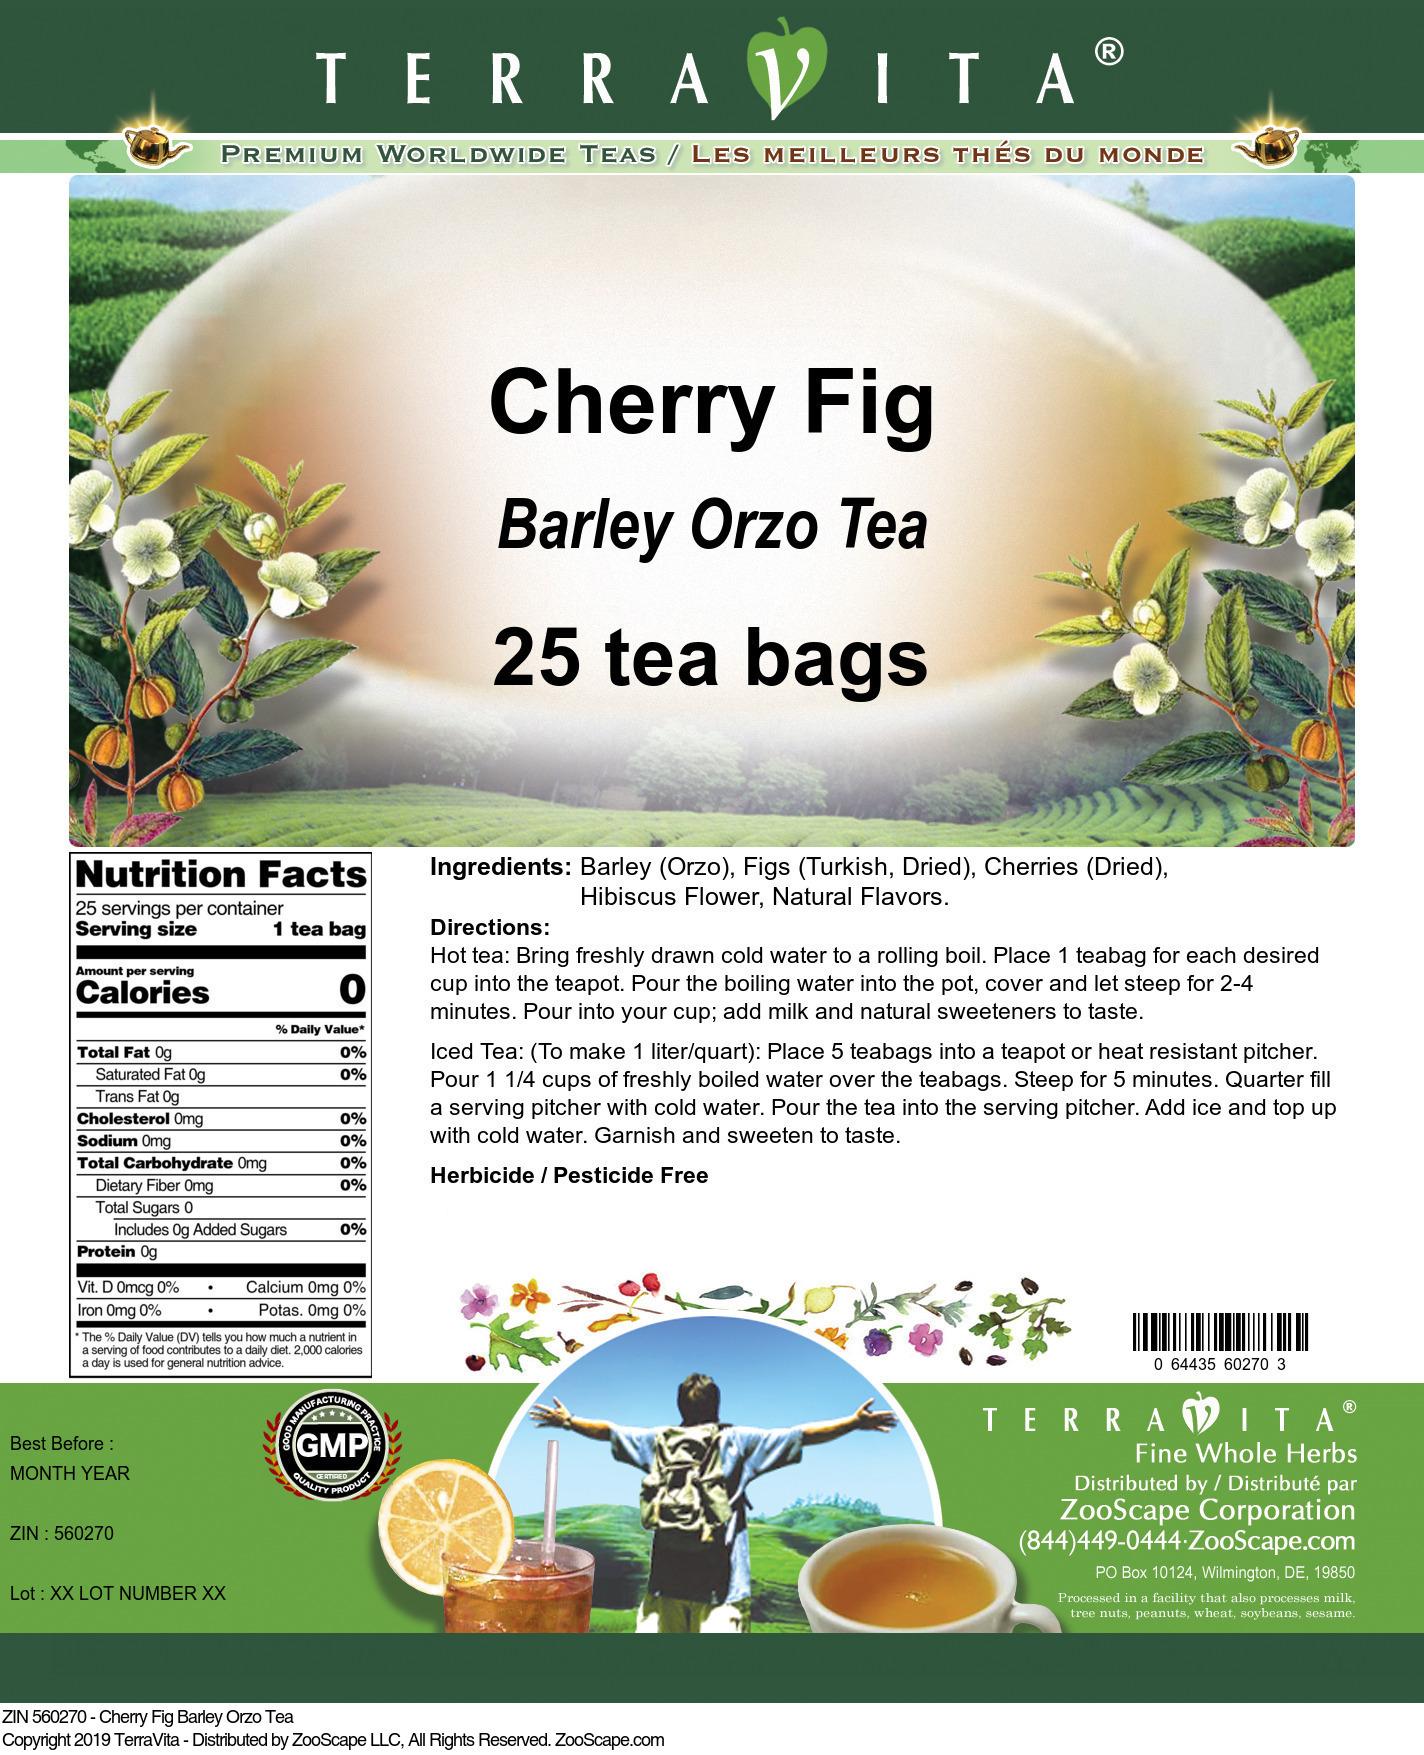 Cherry Fig Barley Orzo